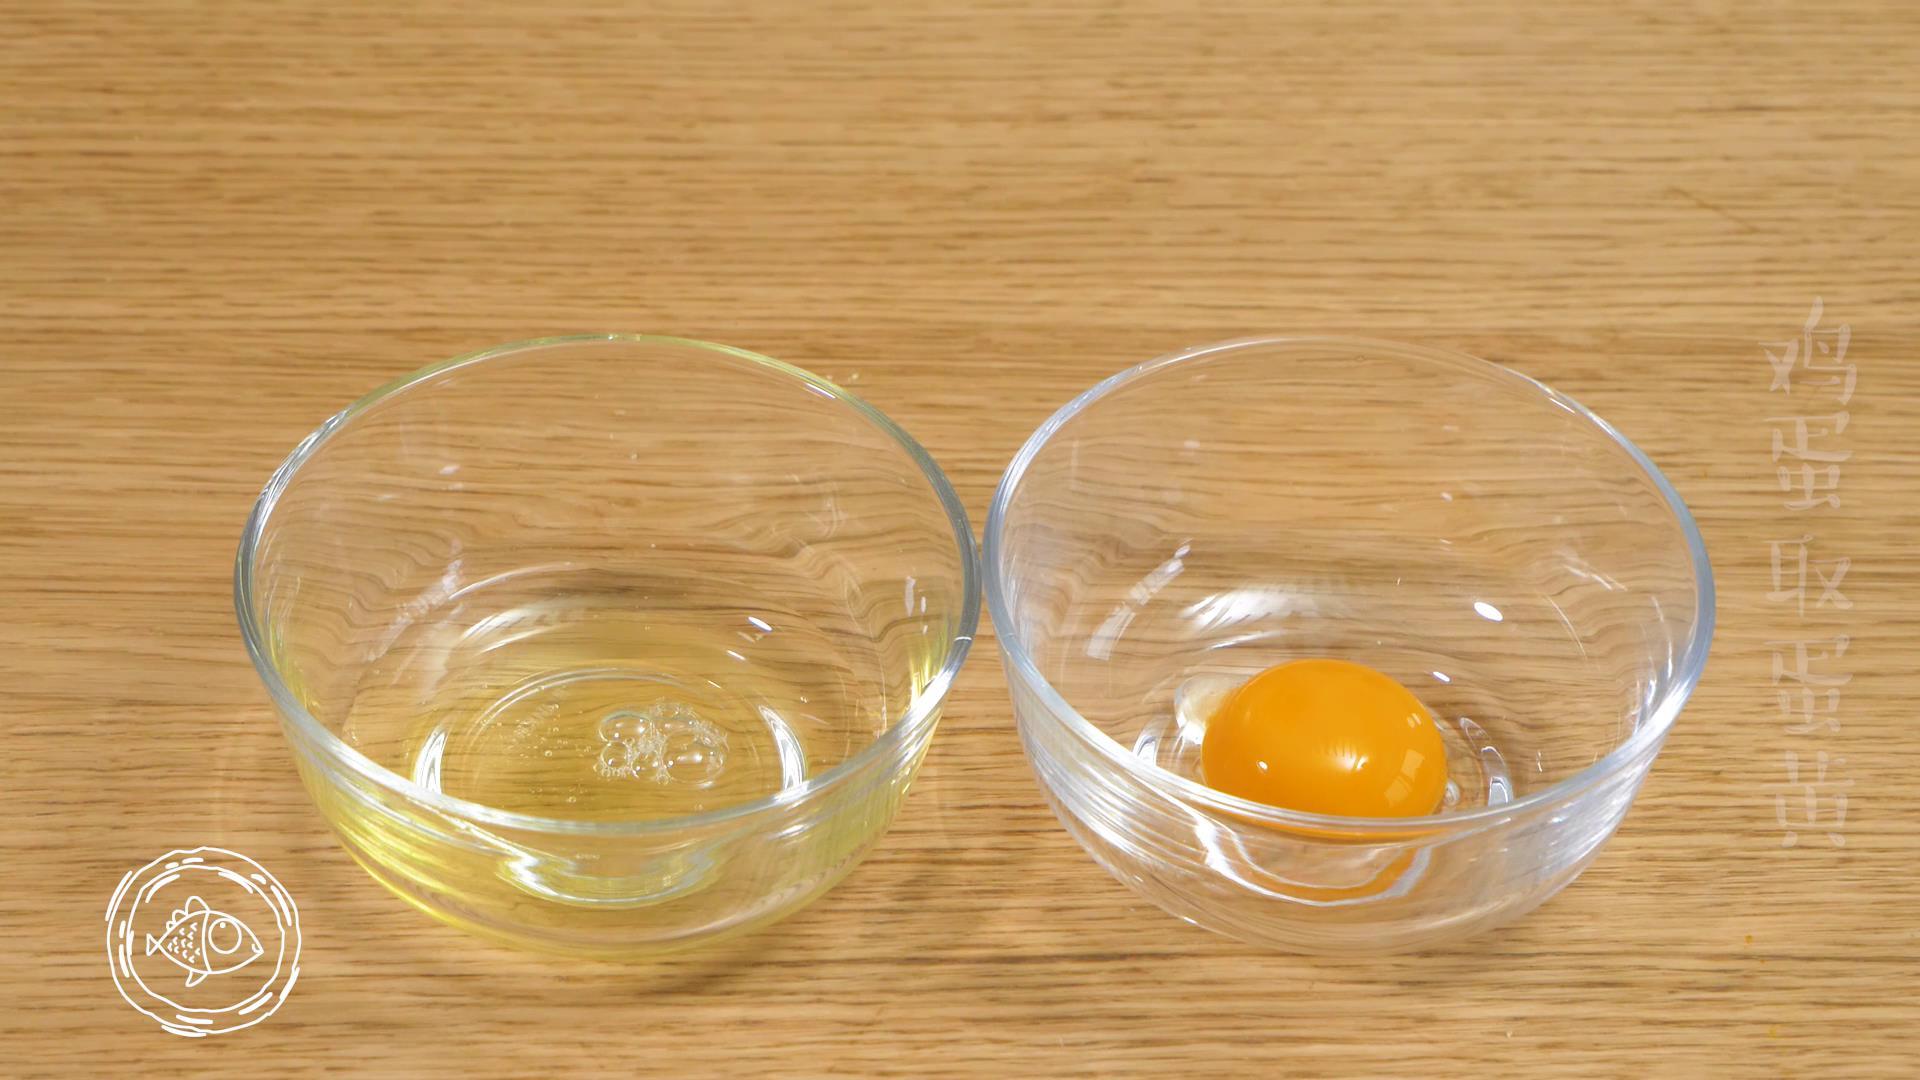 8m+南瓜蛋羹,鸡蛋取蛋黄~</p> <p>